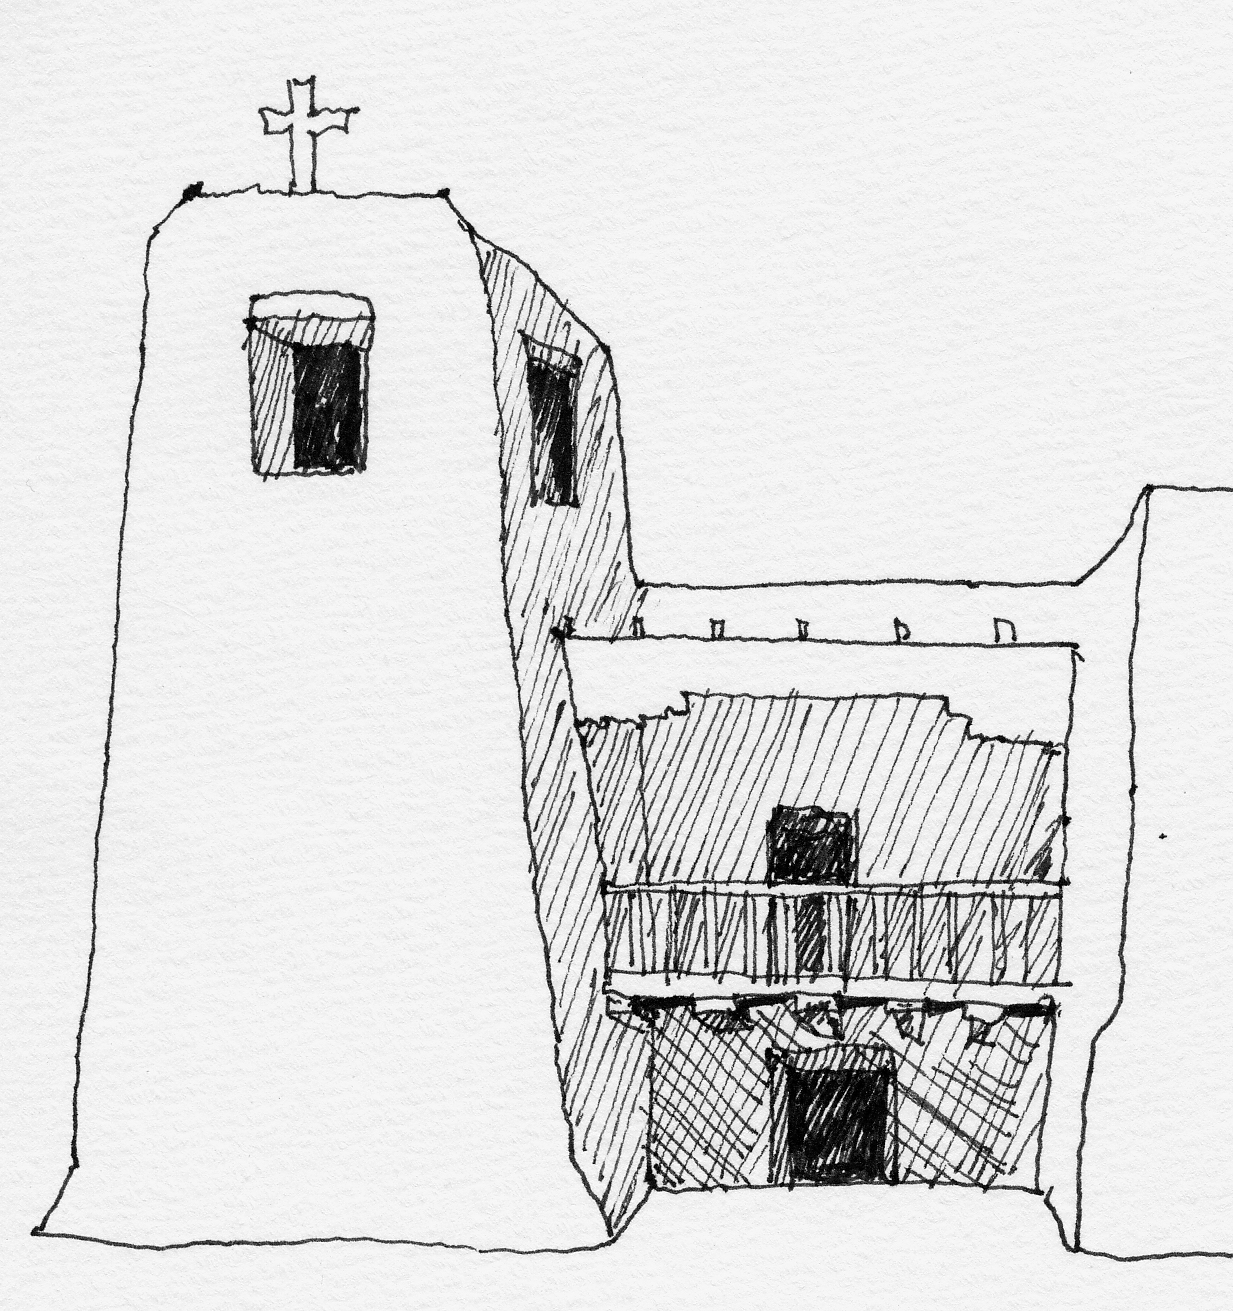 JenJonesArchitecture_Sketch-santafe-01.jpeg